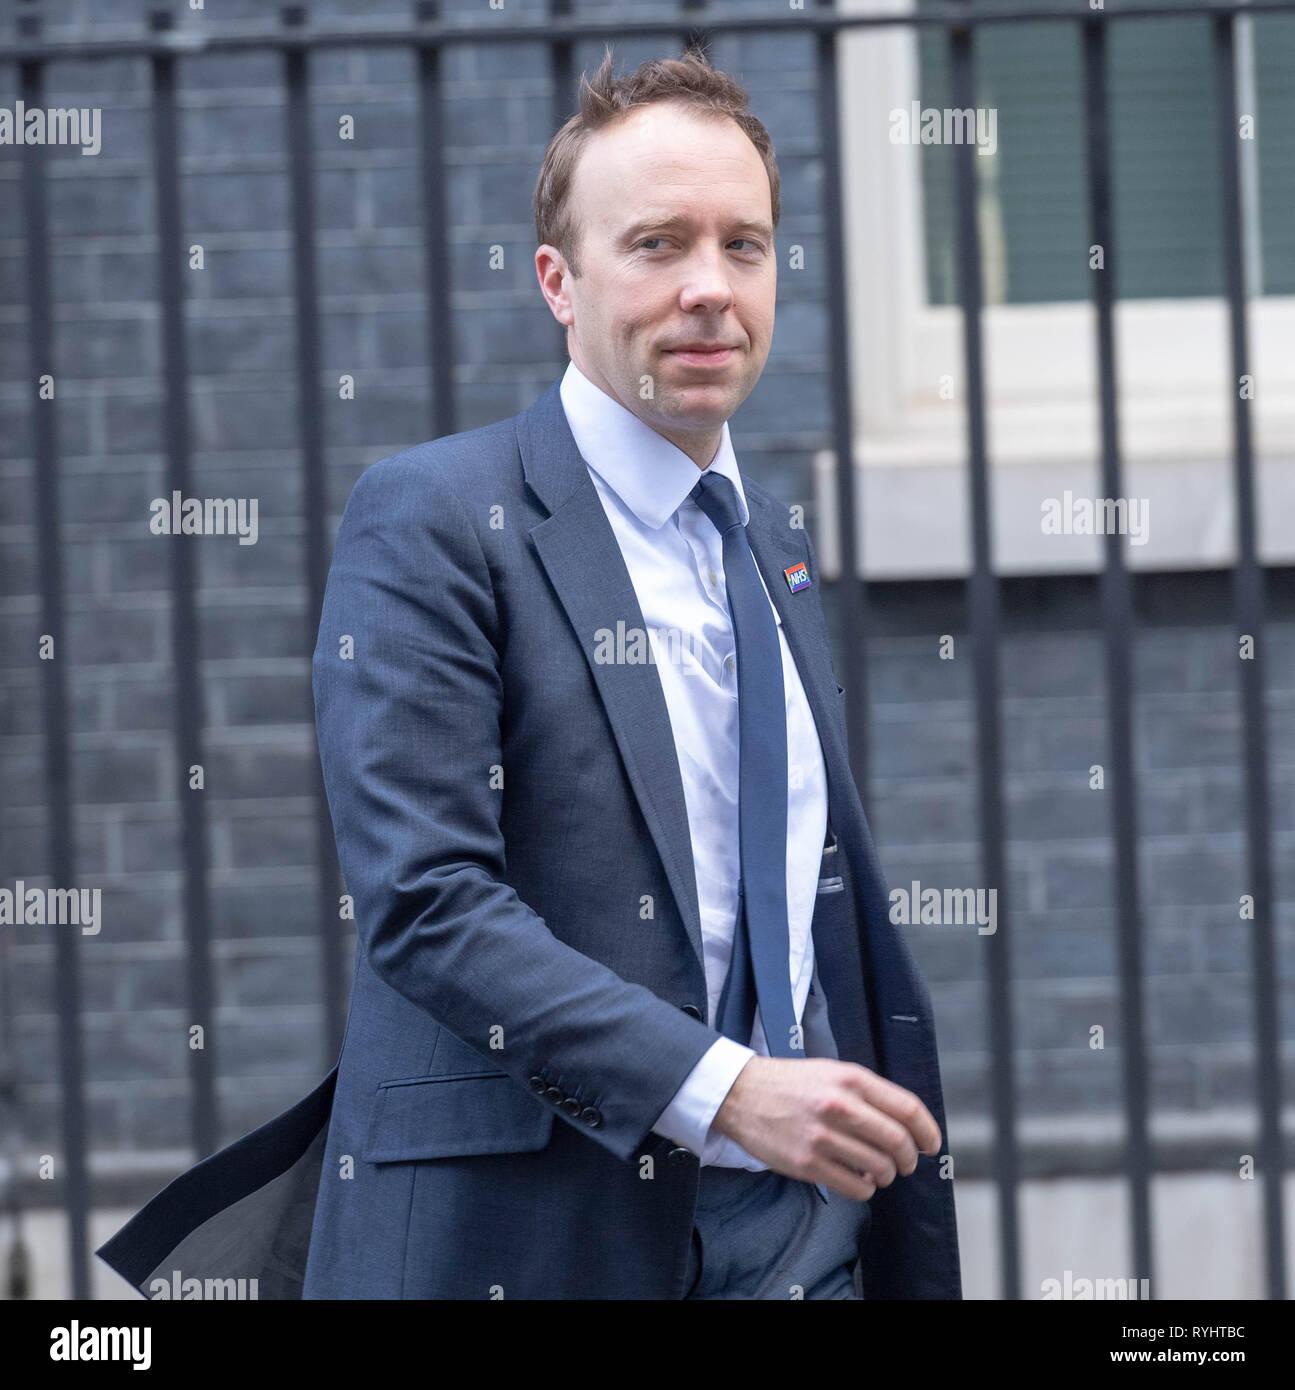 London, UK. 14th March 2019, Matt Hancock, MP PC, Health Secretary leaves a Cabinet meeting at 10 Downing Street, London, UK. Credit: Ian Davidson/Alamy Live News - Stock Image